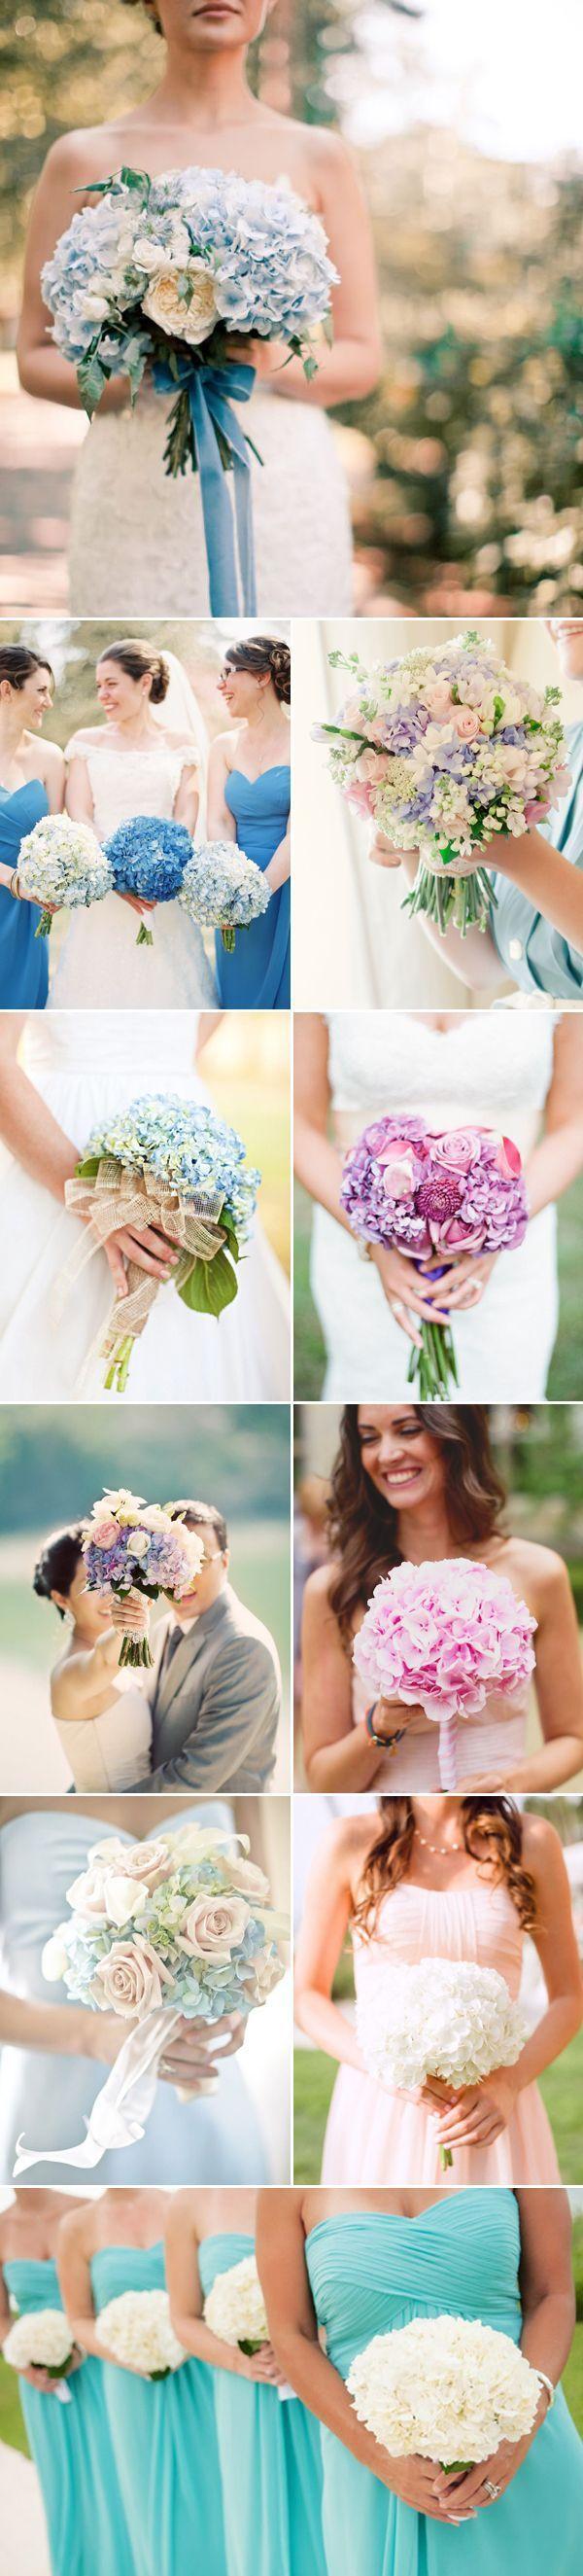 hydrangeas wedding bouquets